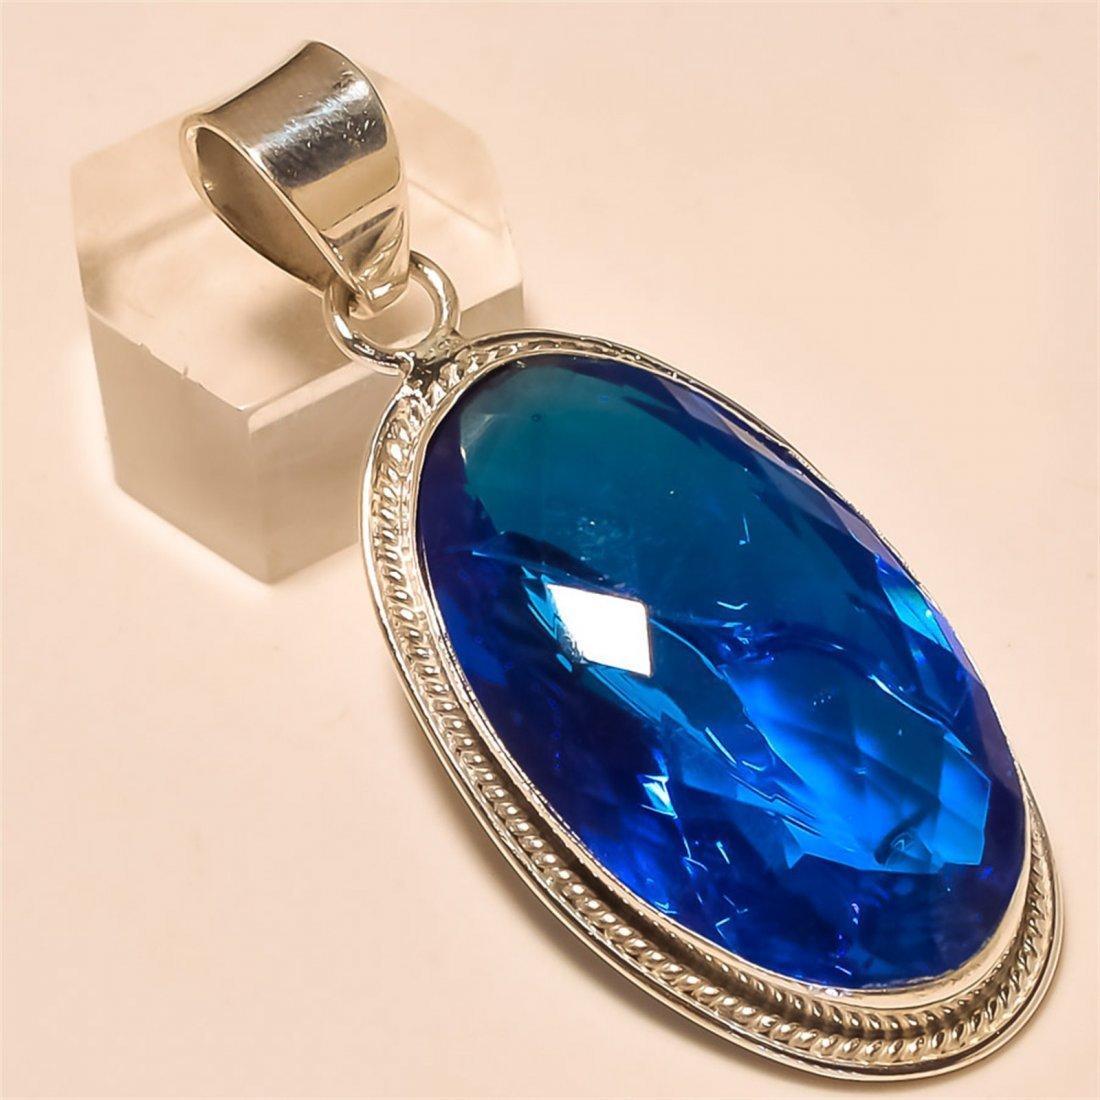 Swiss Blue Topaz Pendant Solid Sterling Silver